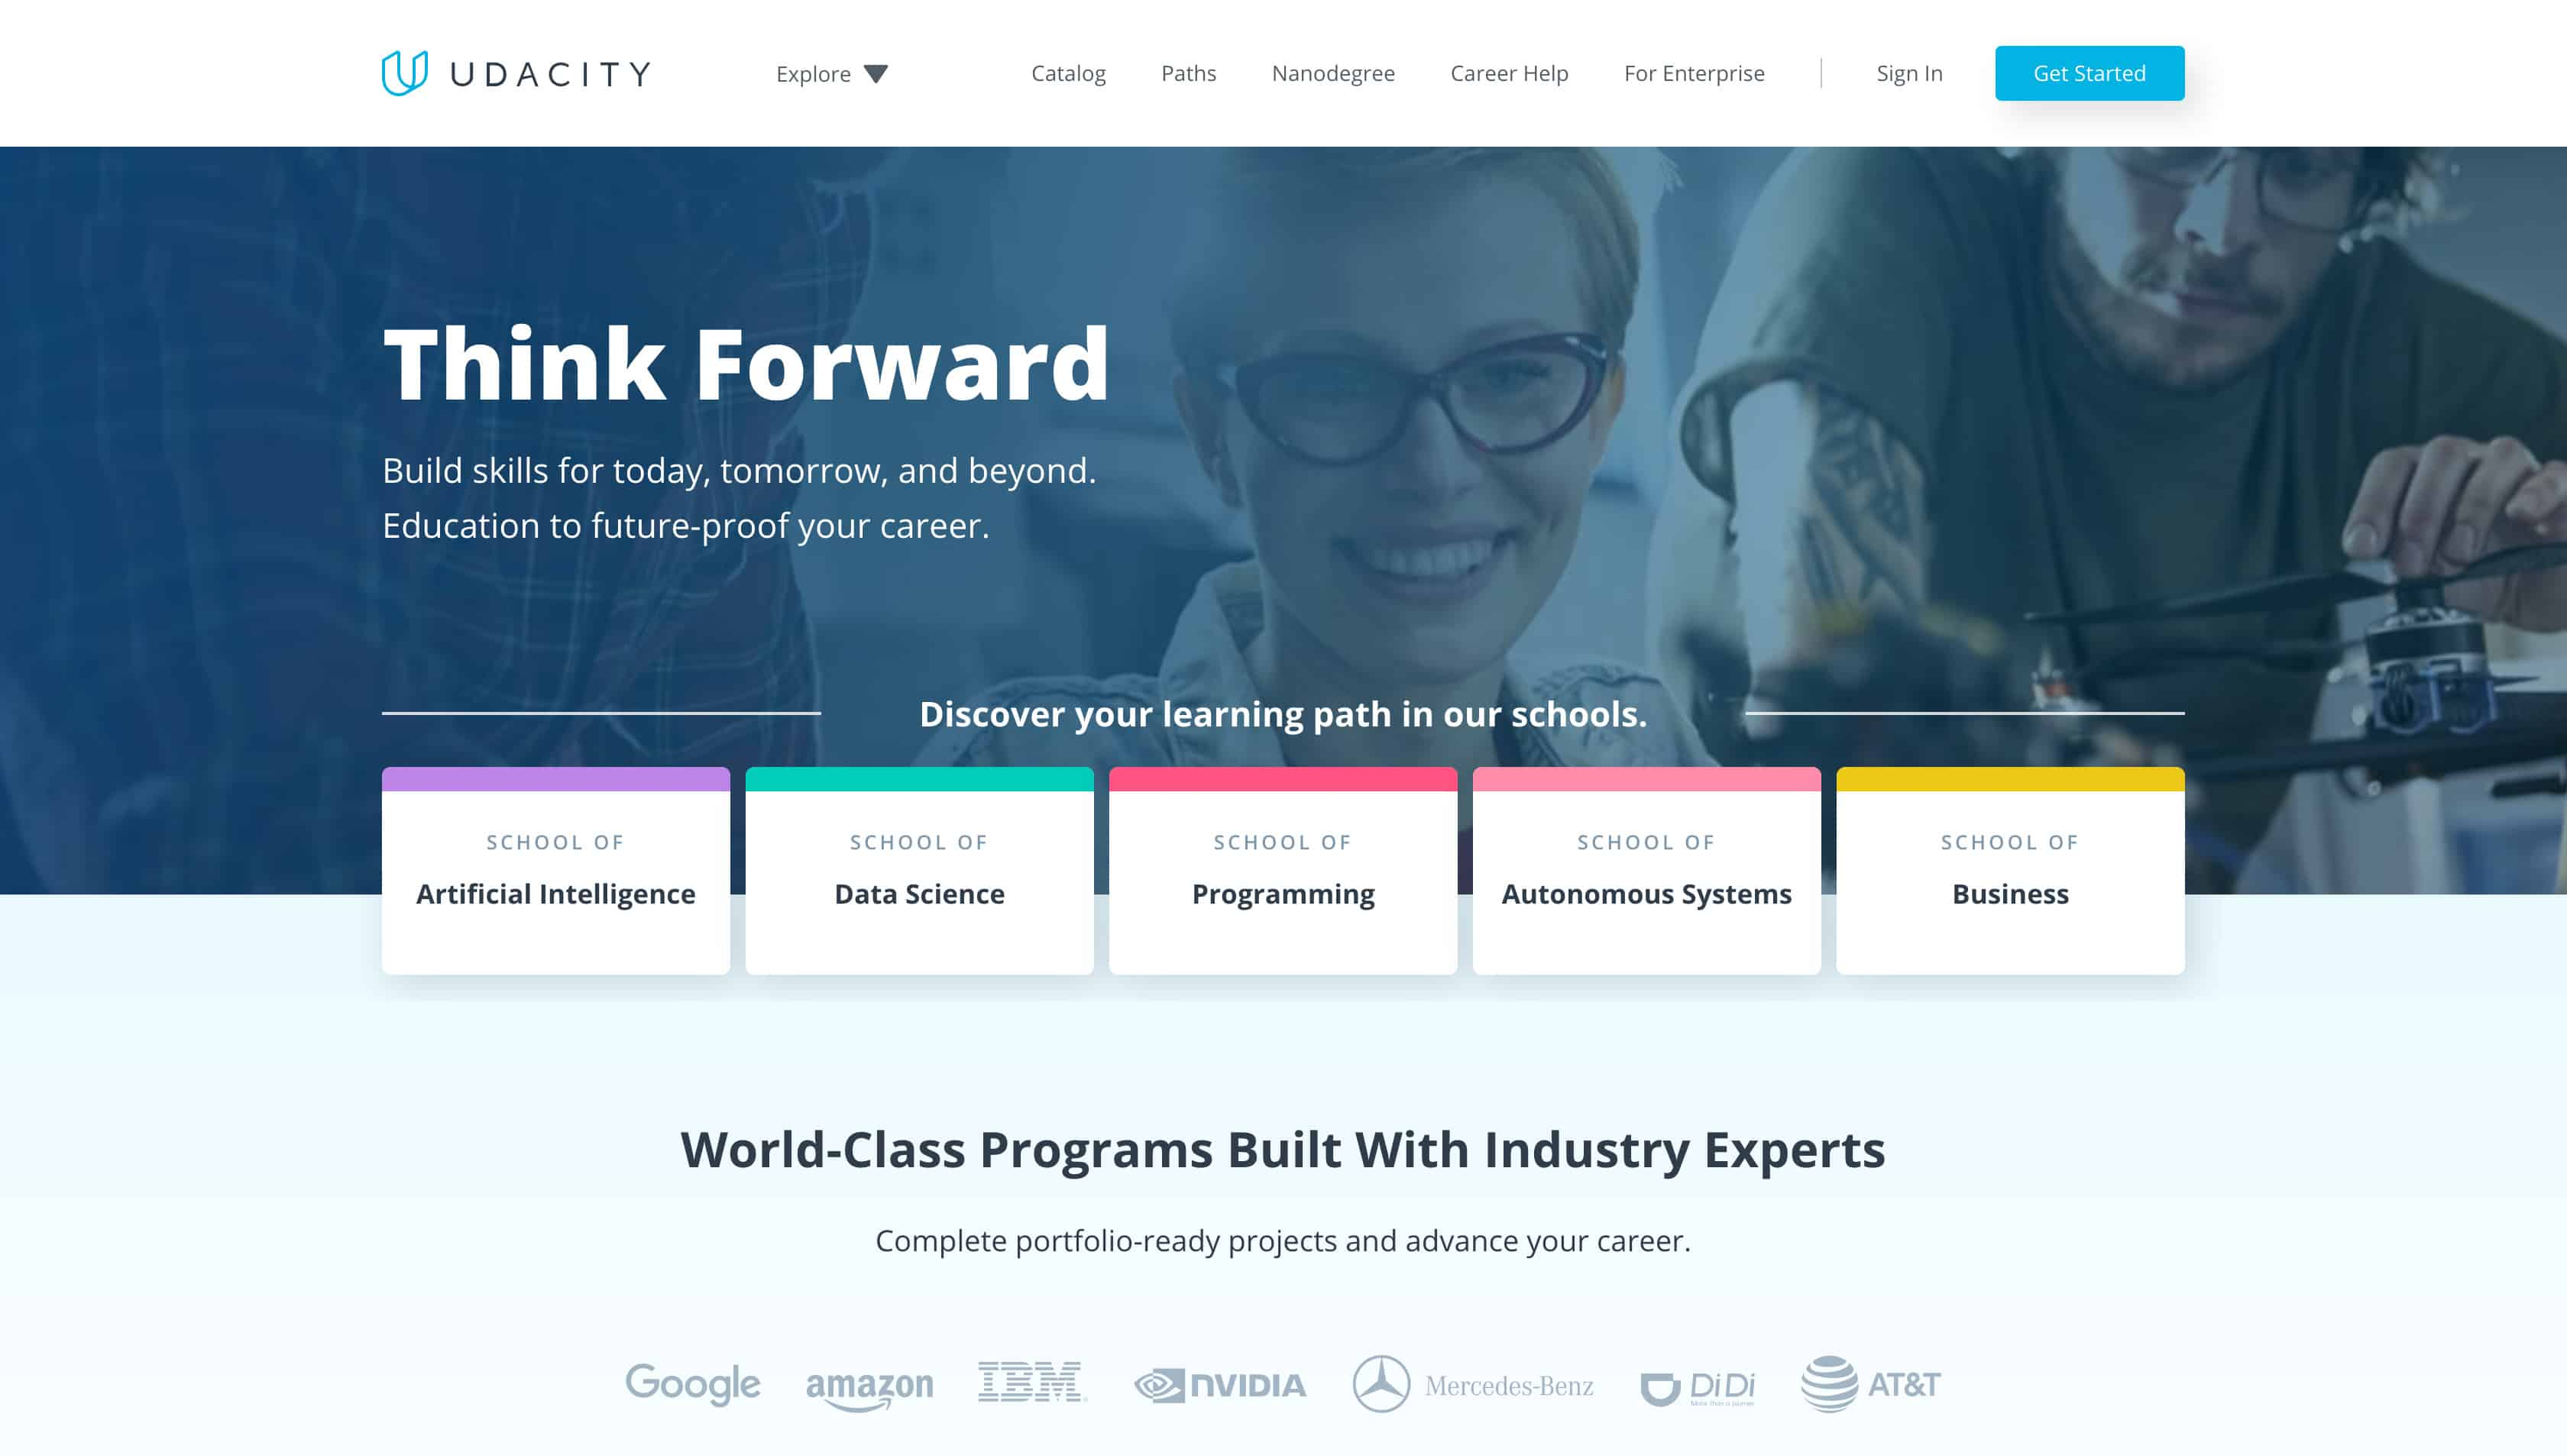 Website For Training -  Udacity